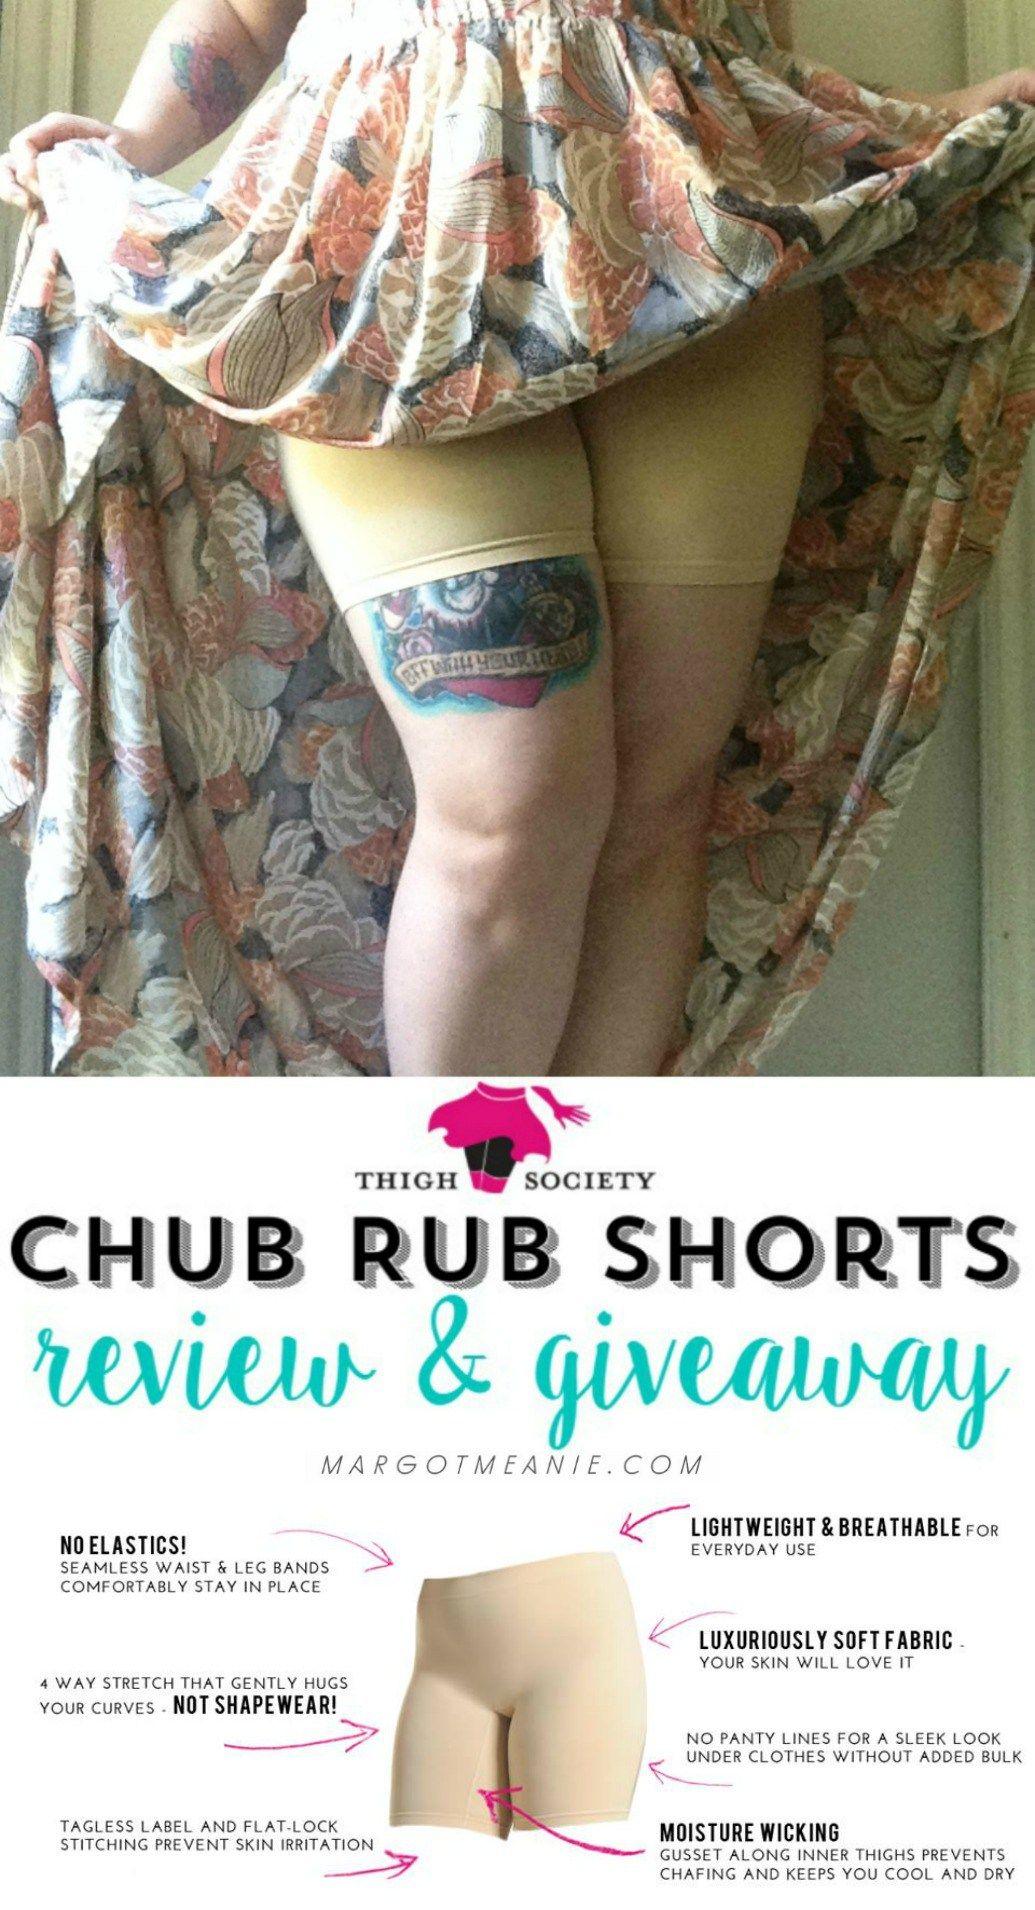 70fed836c3b59 Thigh Society chub rub shorts review and GIVEAWAY   open May 11 - May 18